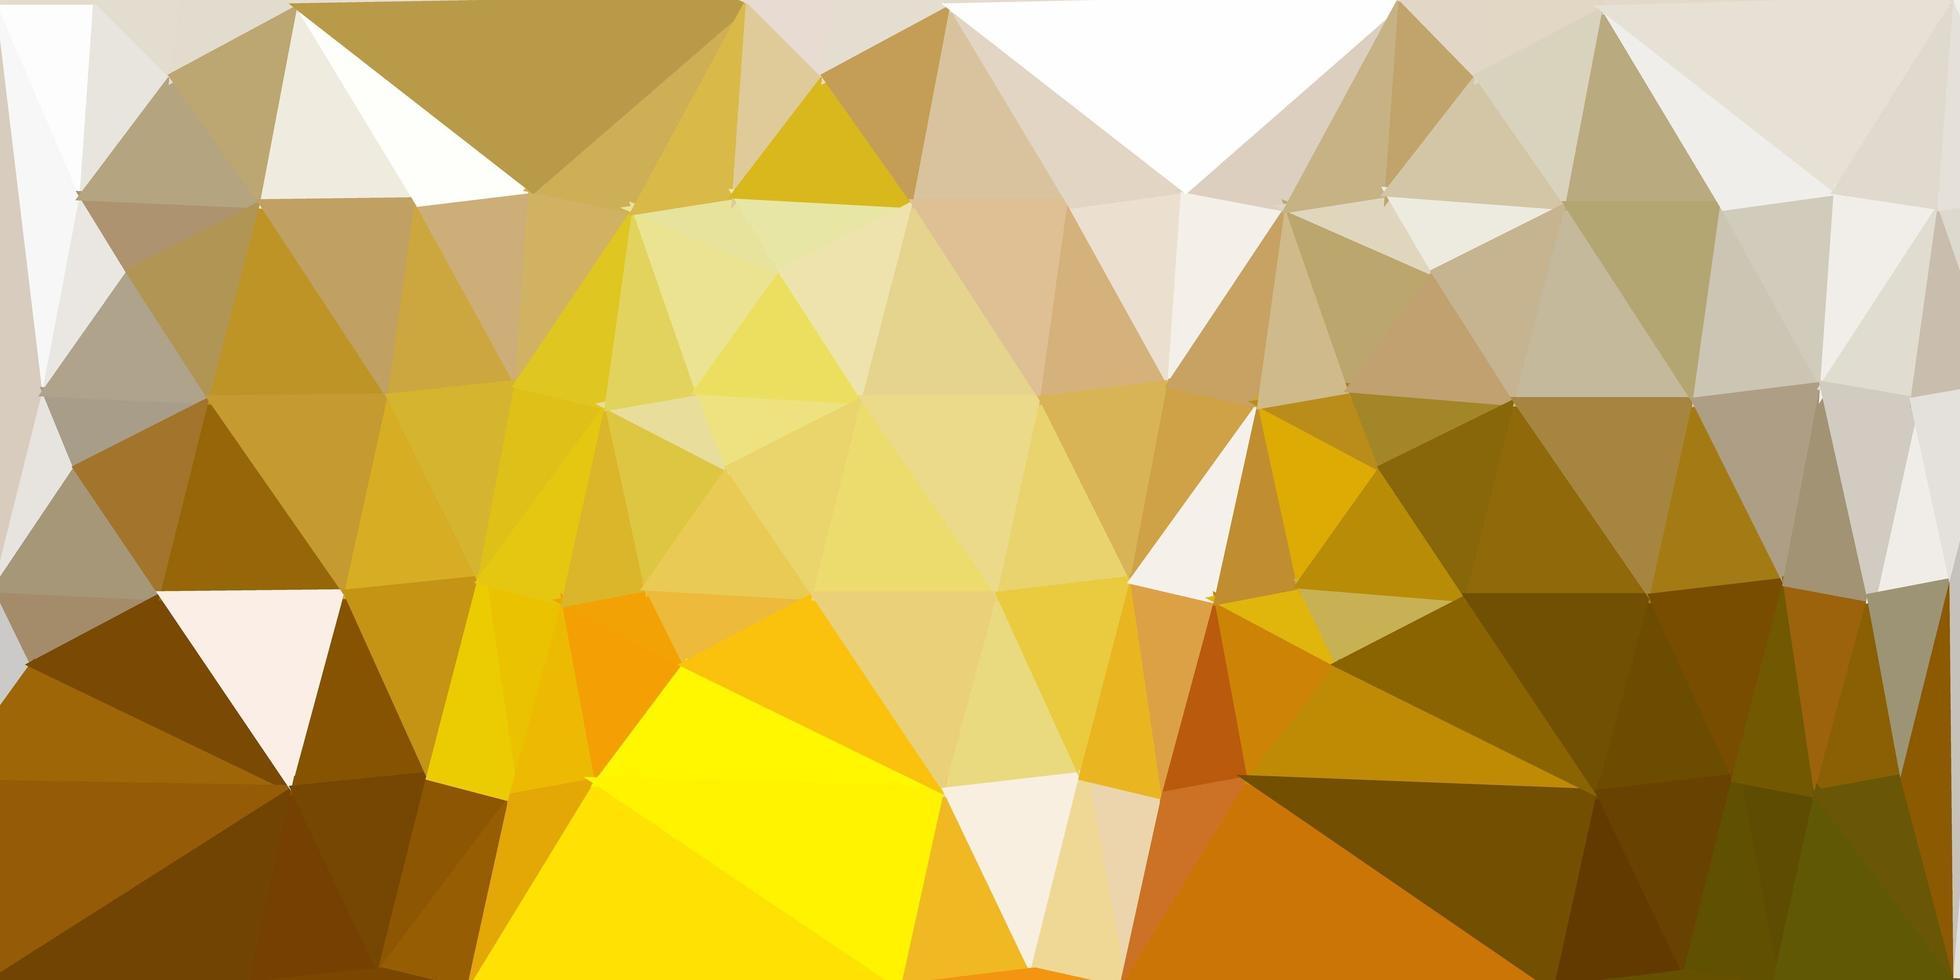 geometrisches polygonales Layout des dunkelgrünen, gelben Vektors. vektor